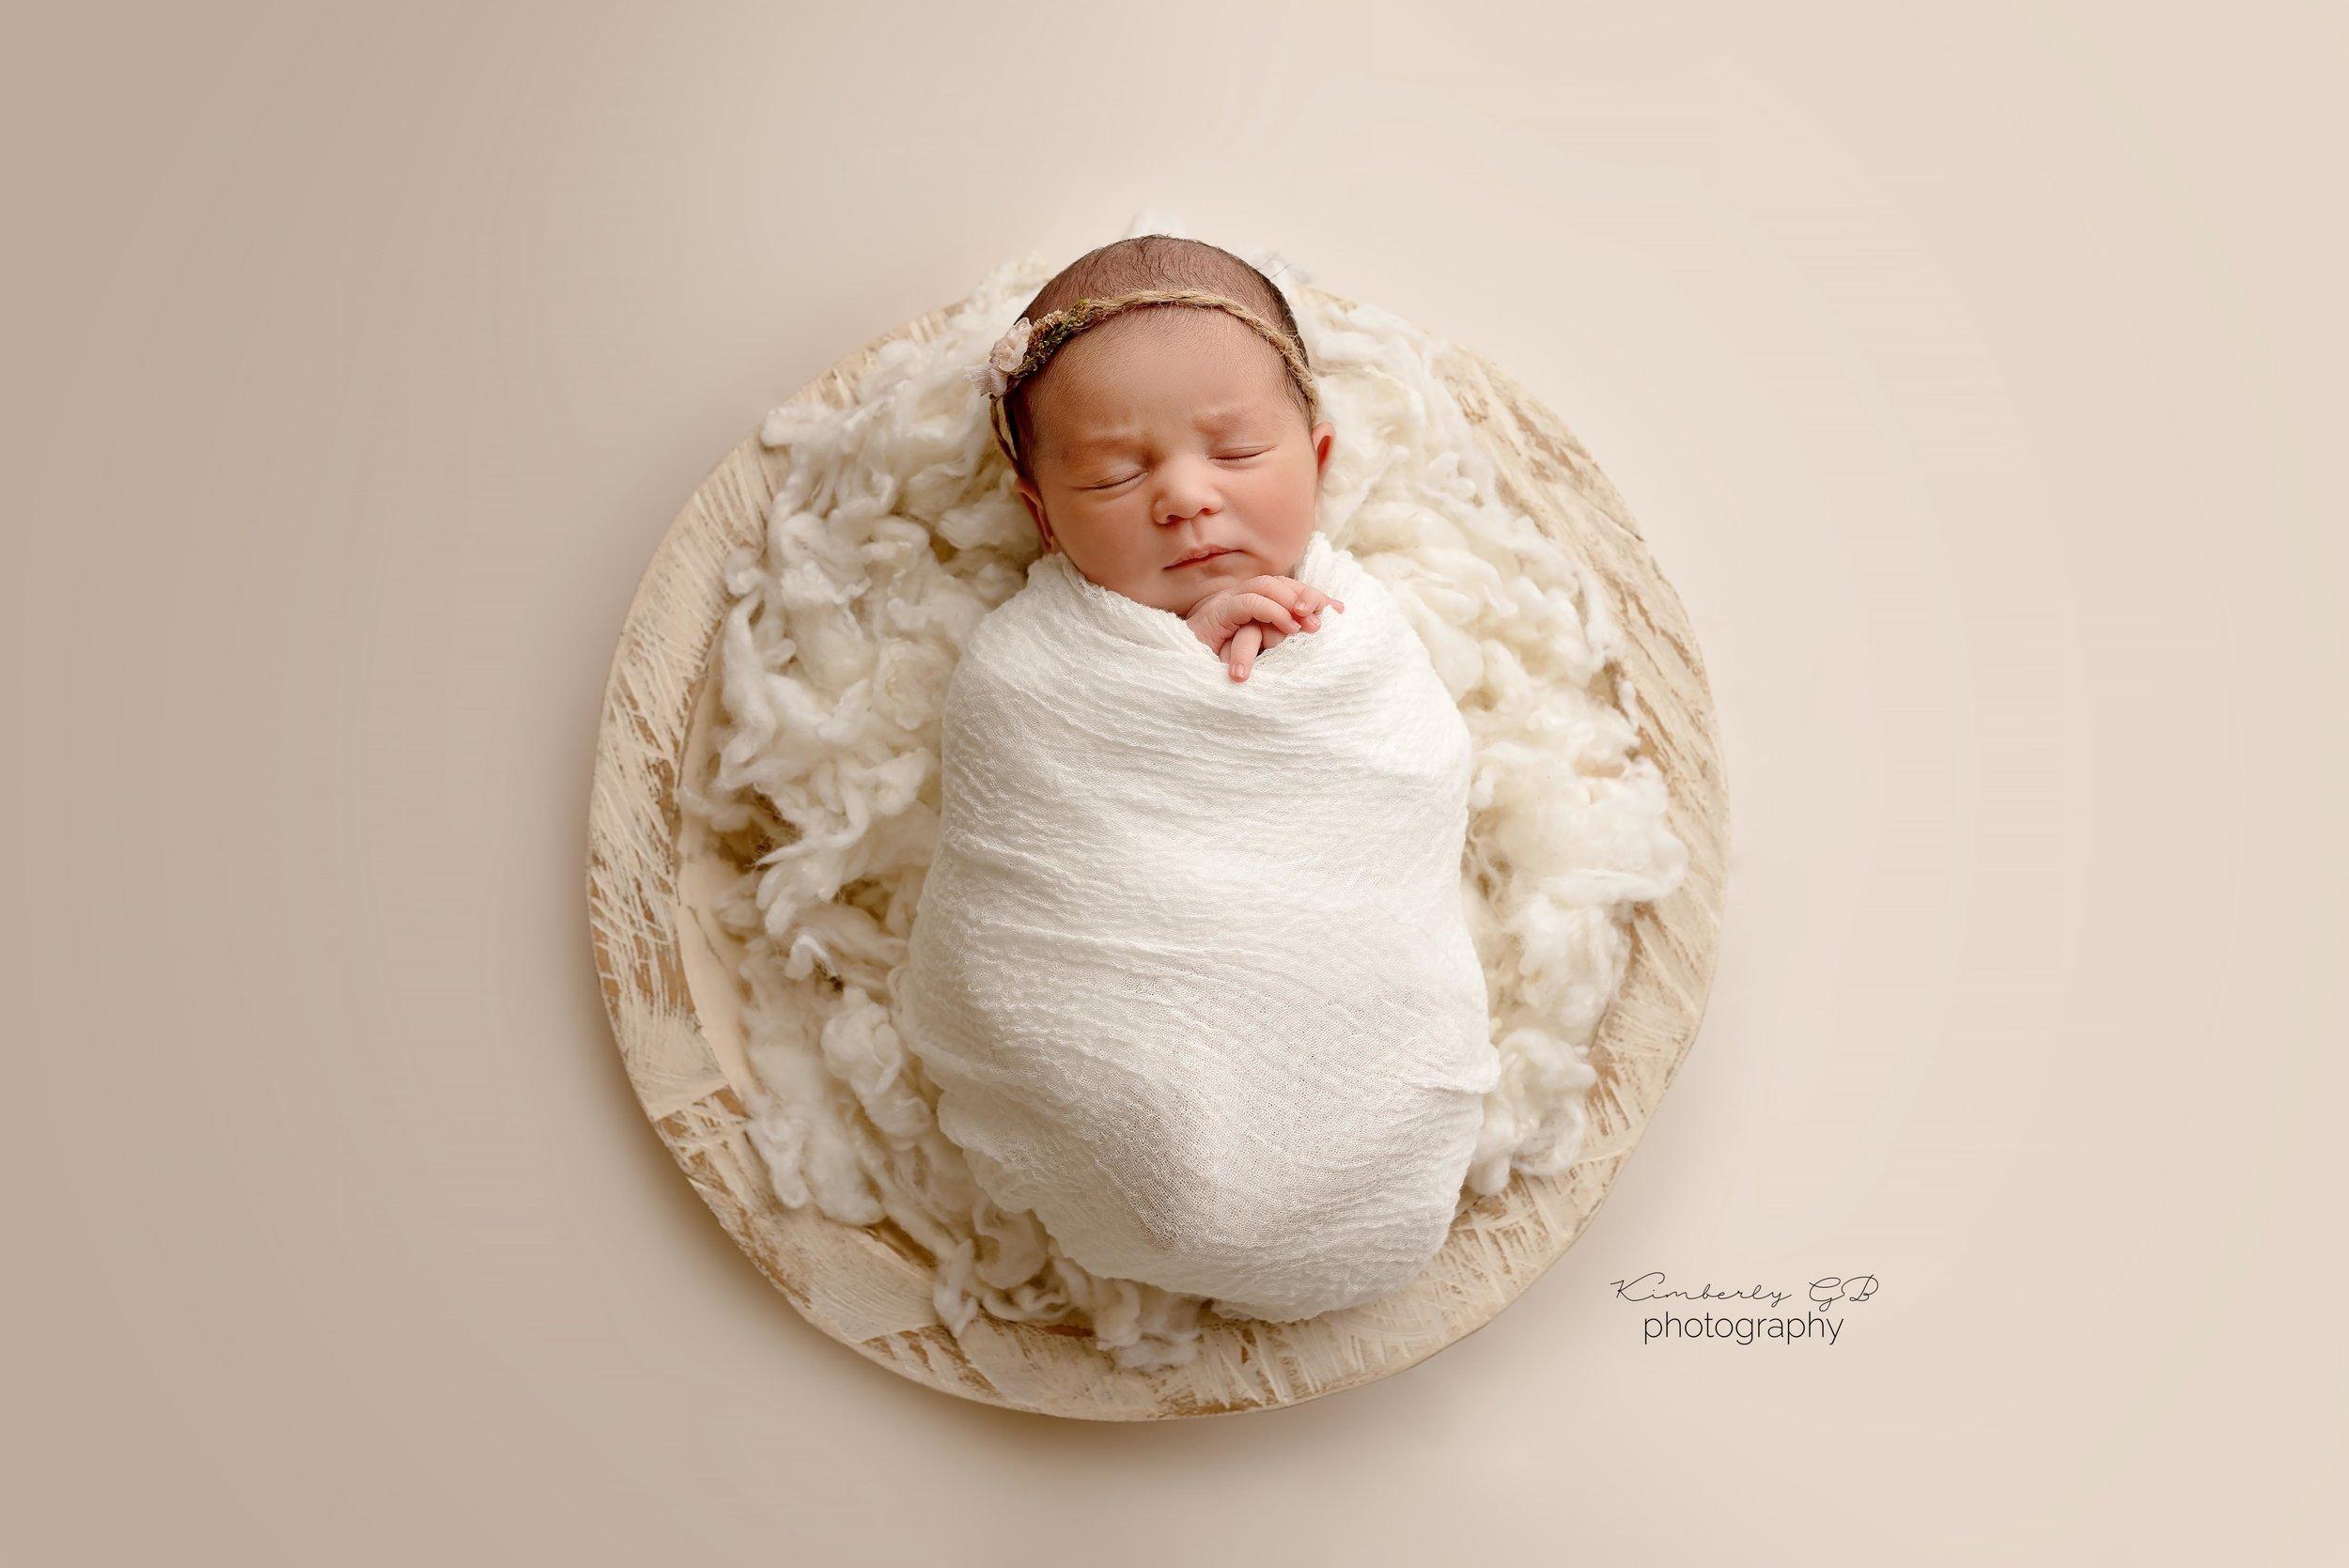 fotografia-de-recien-nacidos-bebes-newborn-en-puerto-rico-kimberly-gb-photography-fotografa-260.jpg